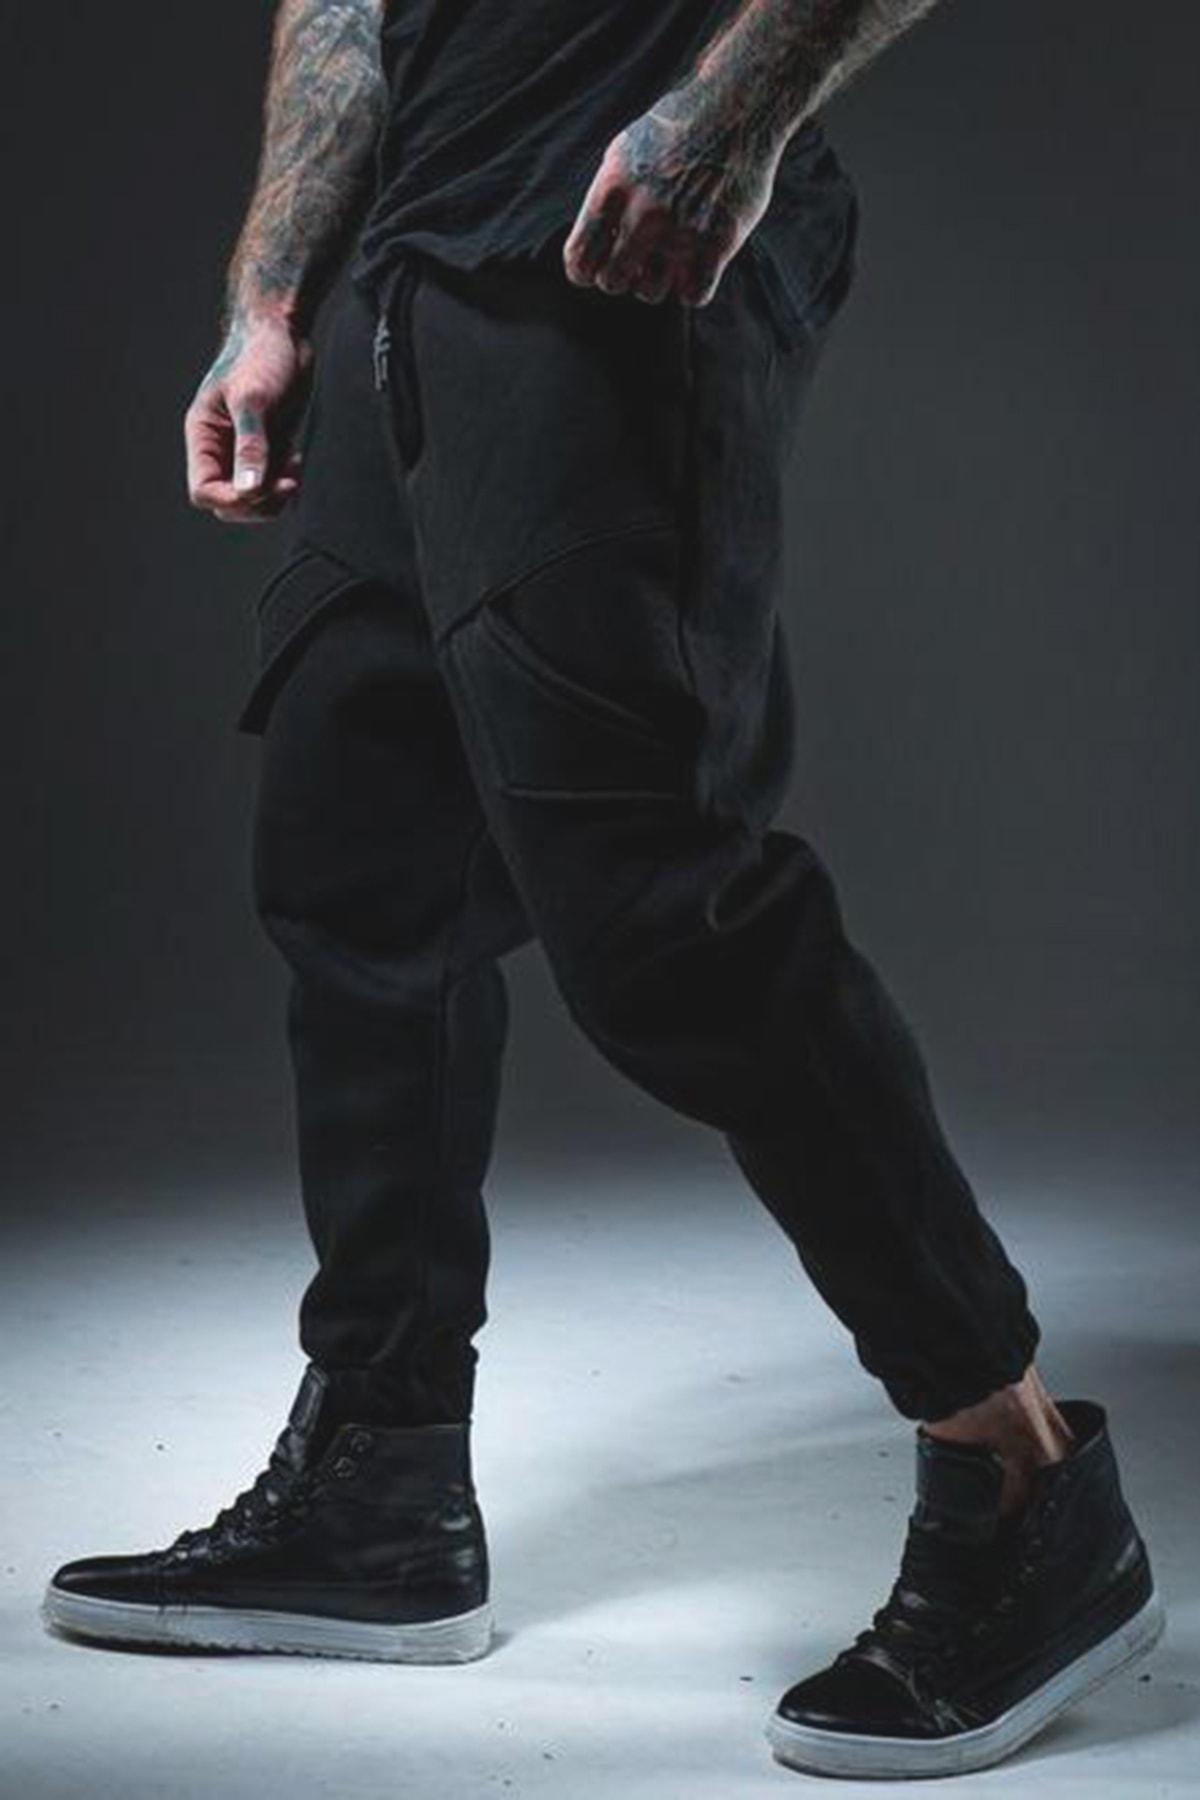 XHAN Erkek Siyah Cep Detaylı Şalvar 1kxe8-44376-02 2